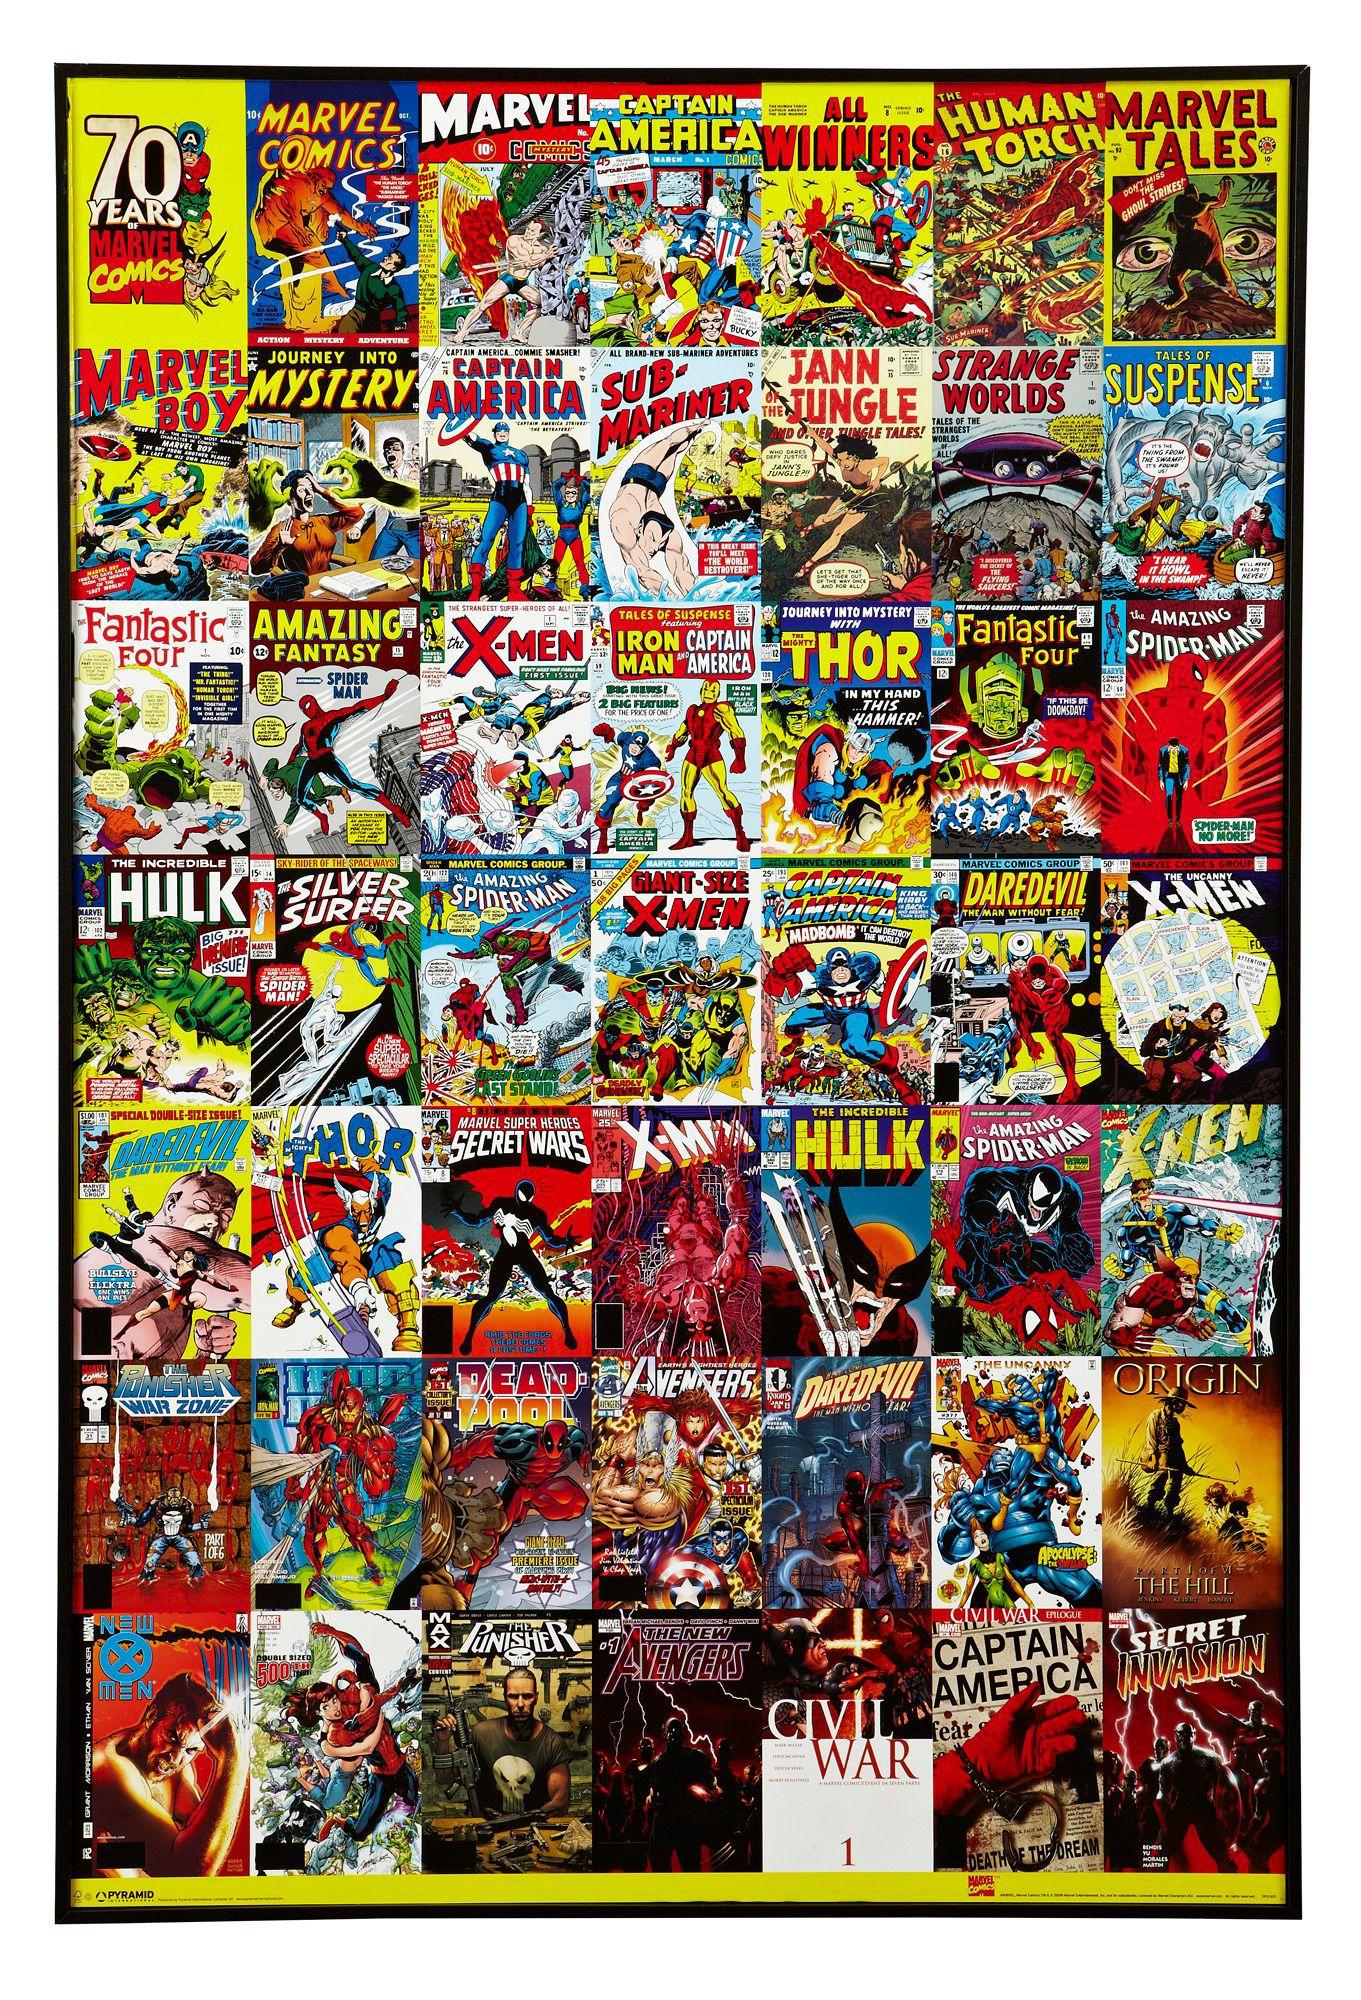 Marvel Comic Multicolour Wall Art  W 62cm  H 92 5cm   Departments   DIY at  B Q. Marvel Comic Multicolour Wall Art  W 62cm  H 92 5cm   Departments